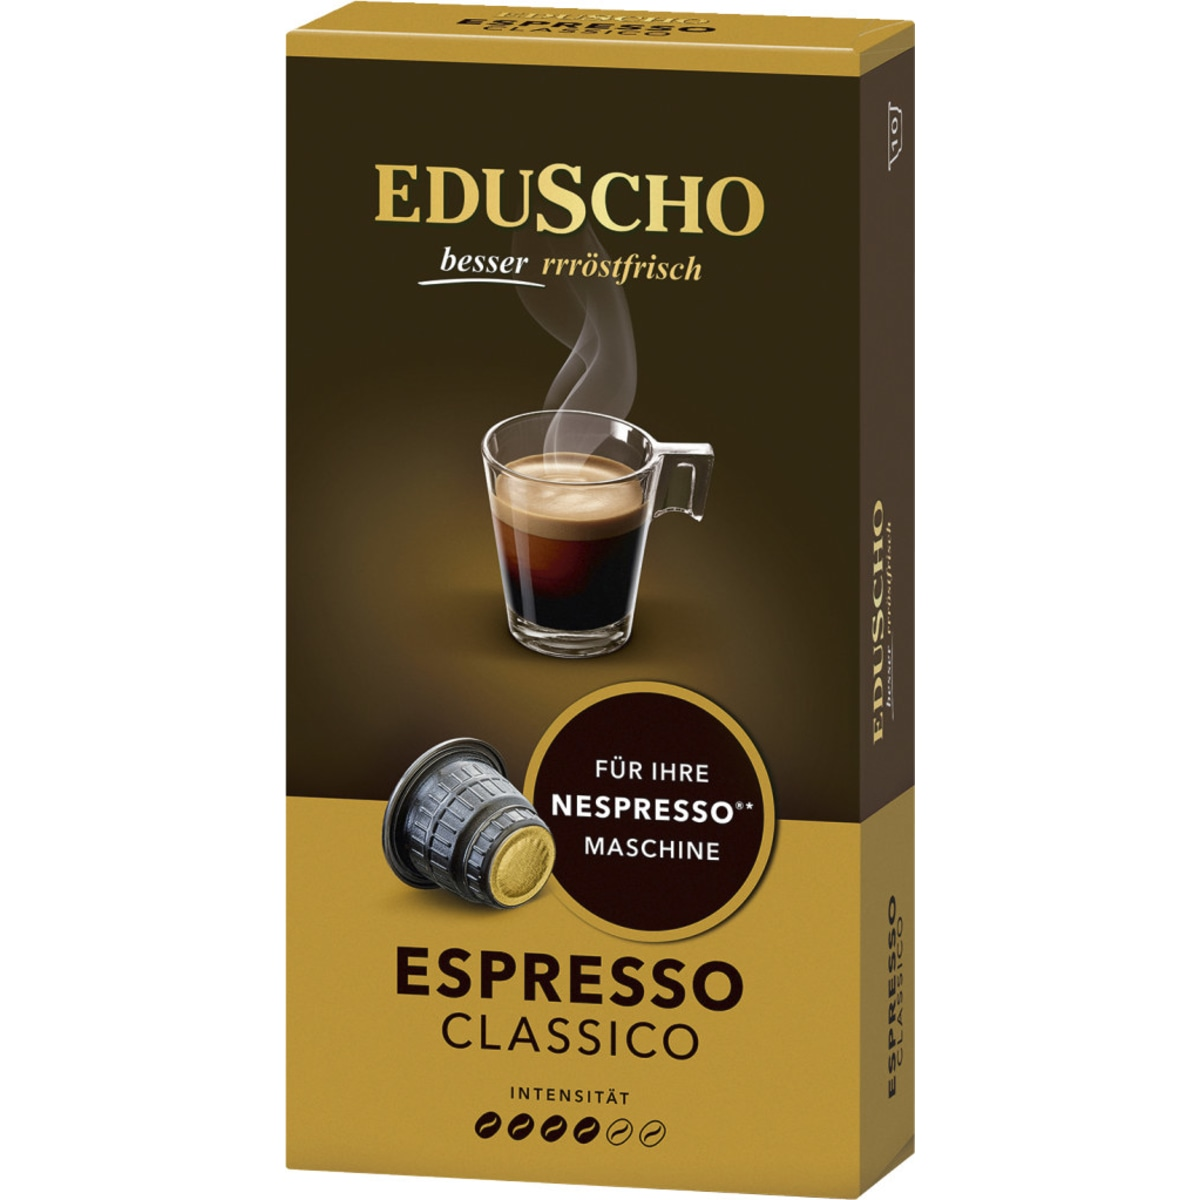 Eduscho NC Espresso Classico Kapseln